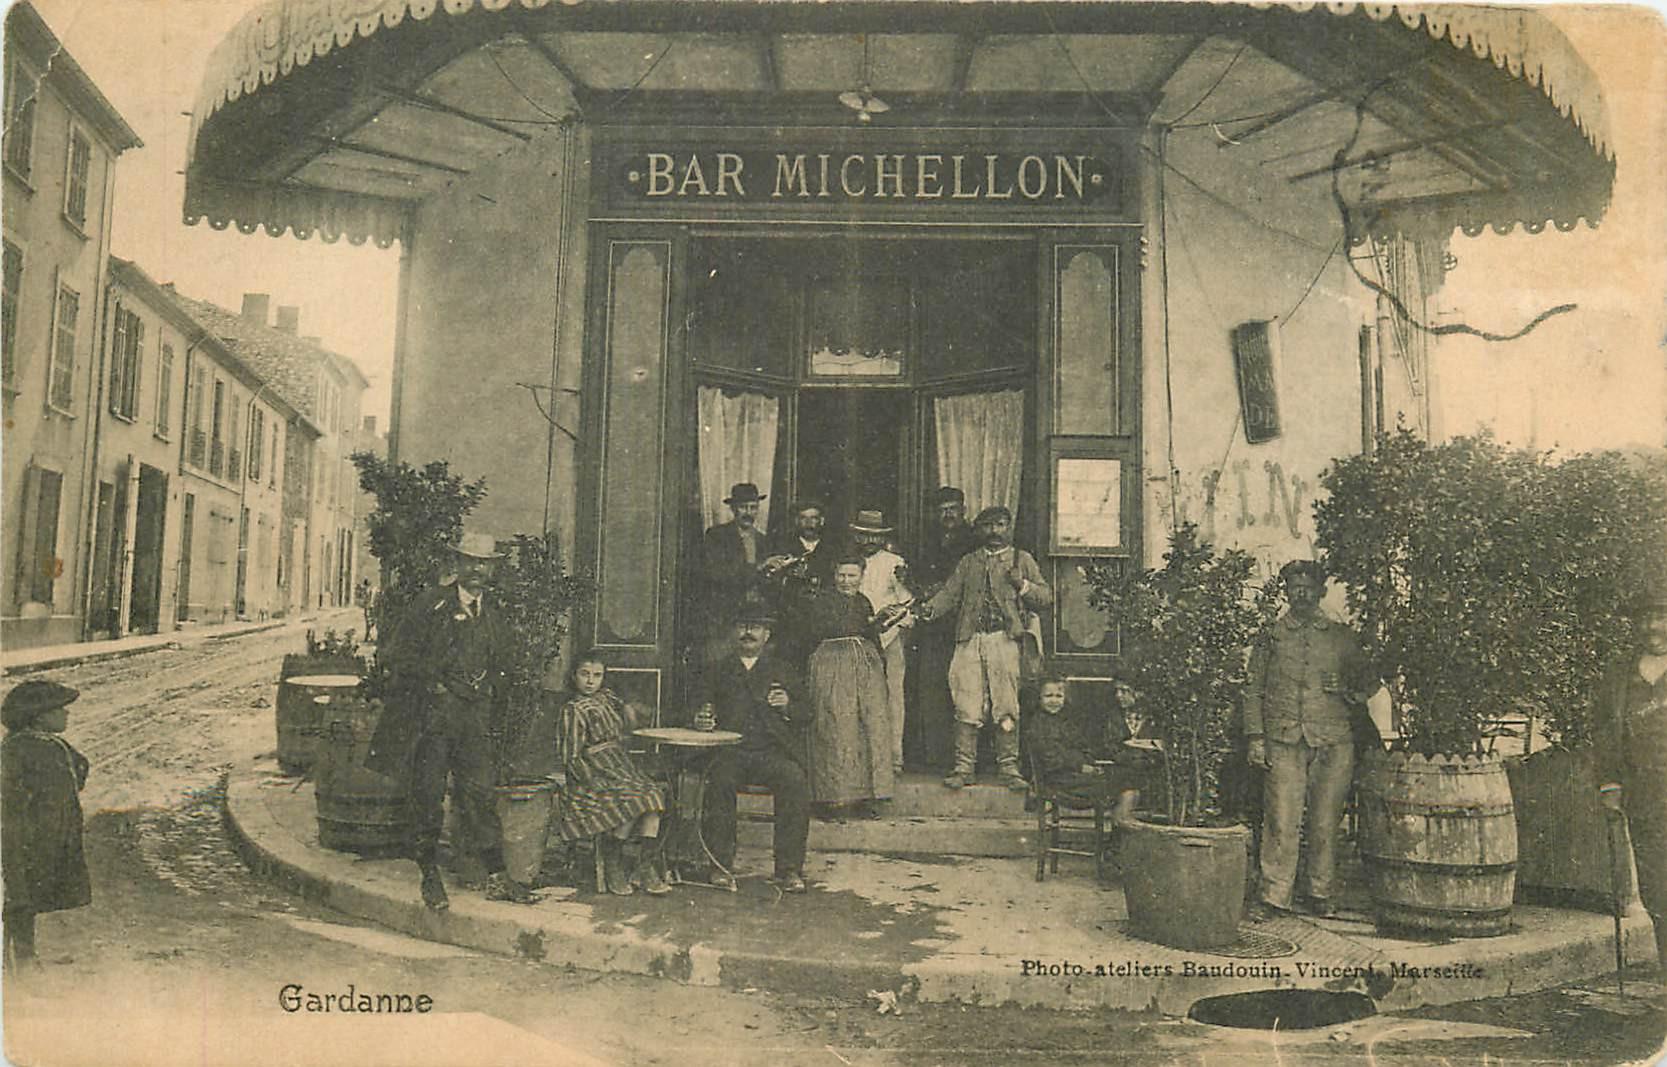 WW 13 GARDANNE. Le Bar Michellon 1917